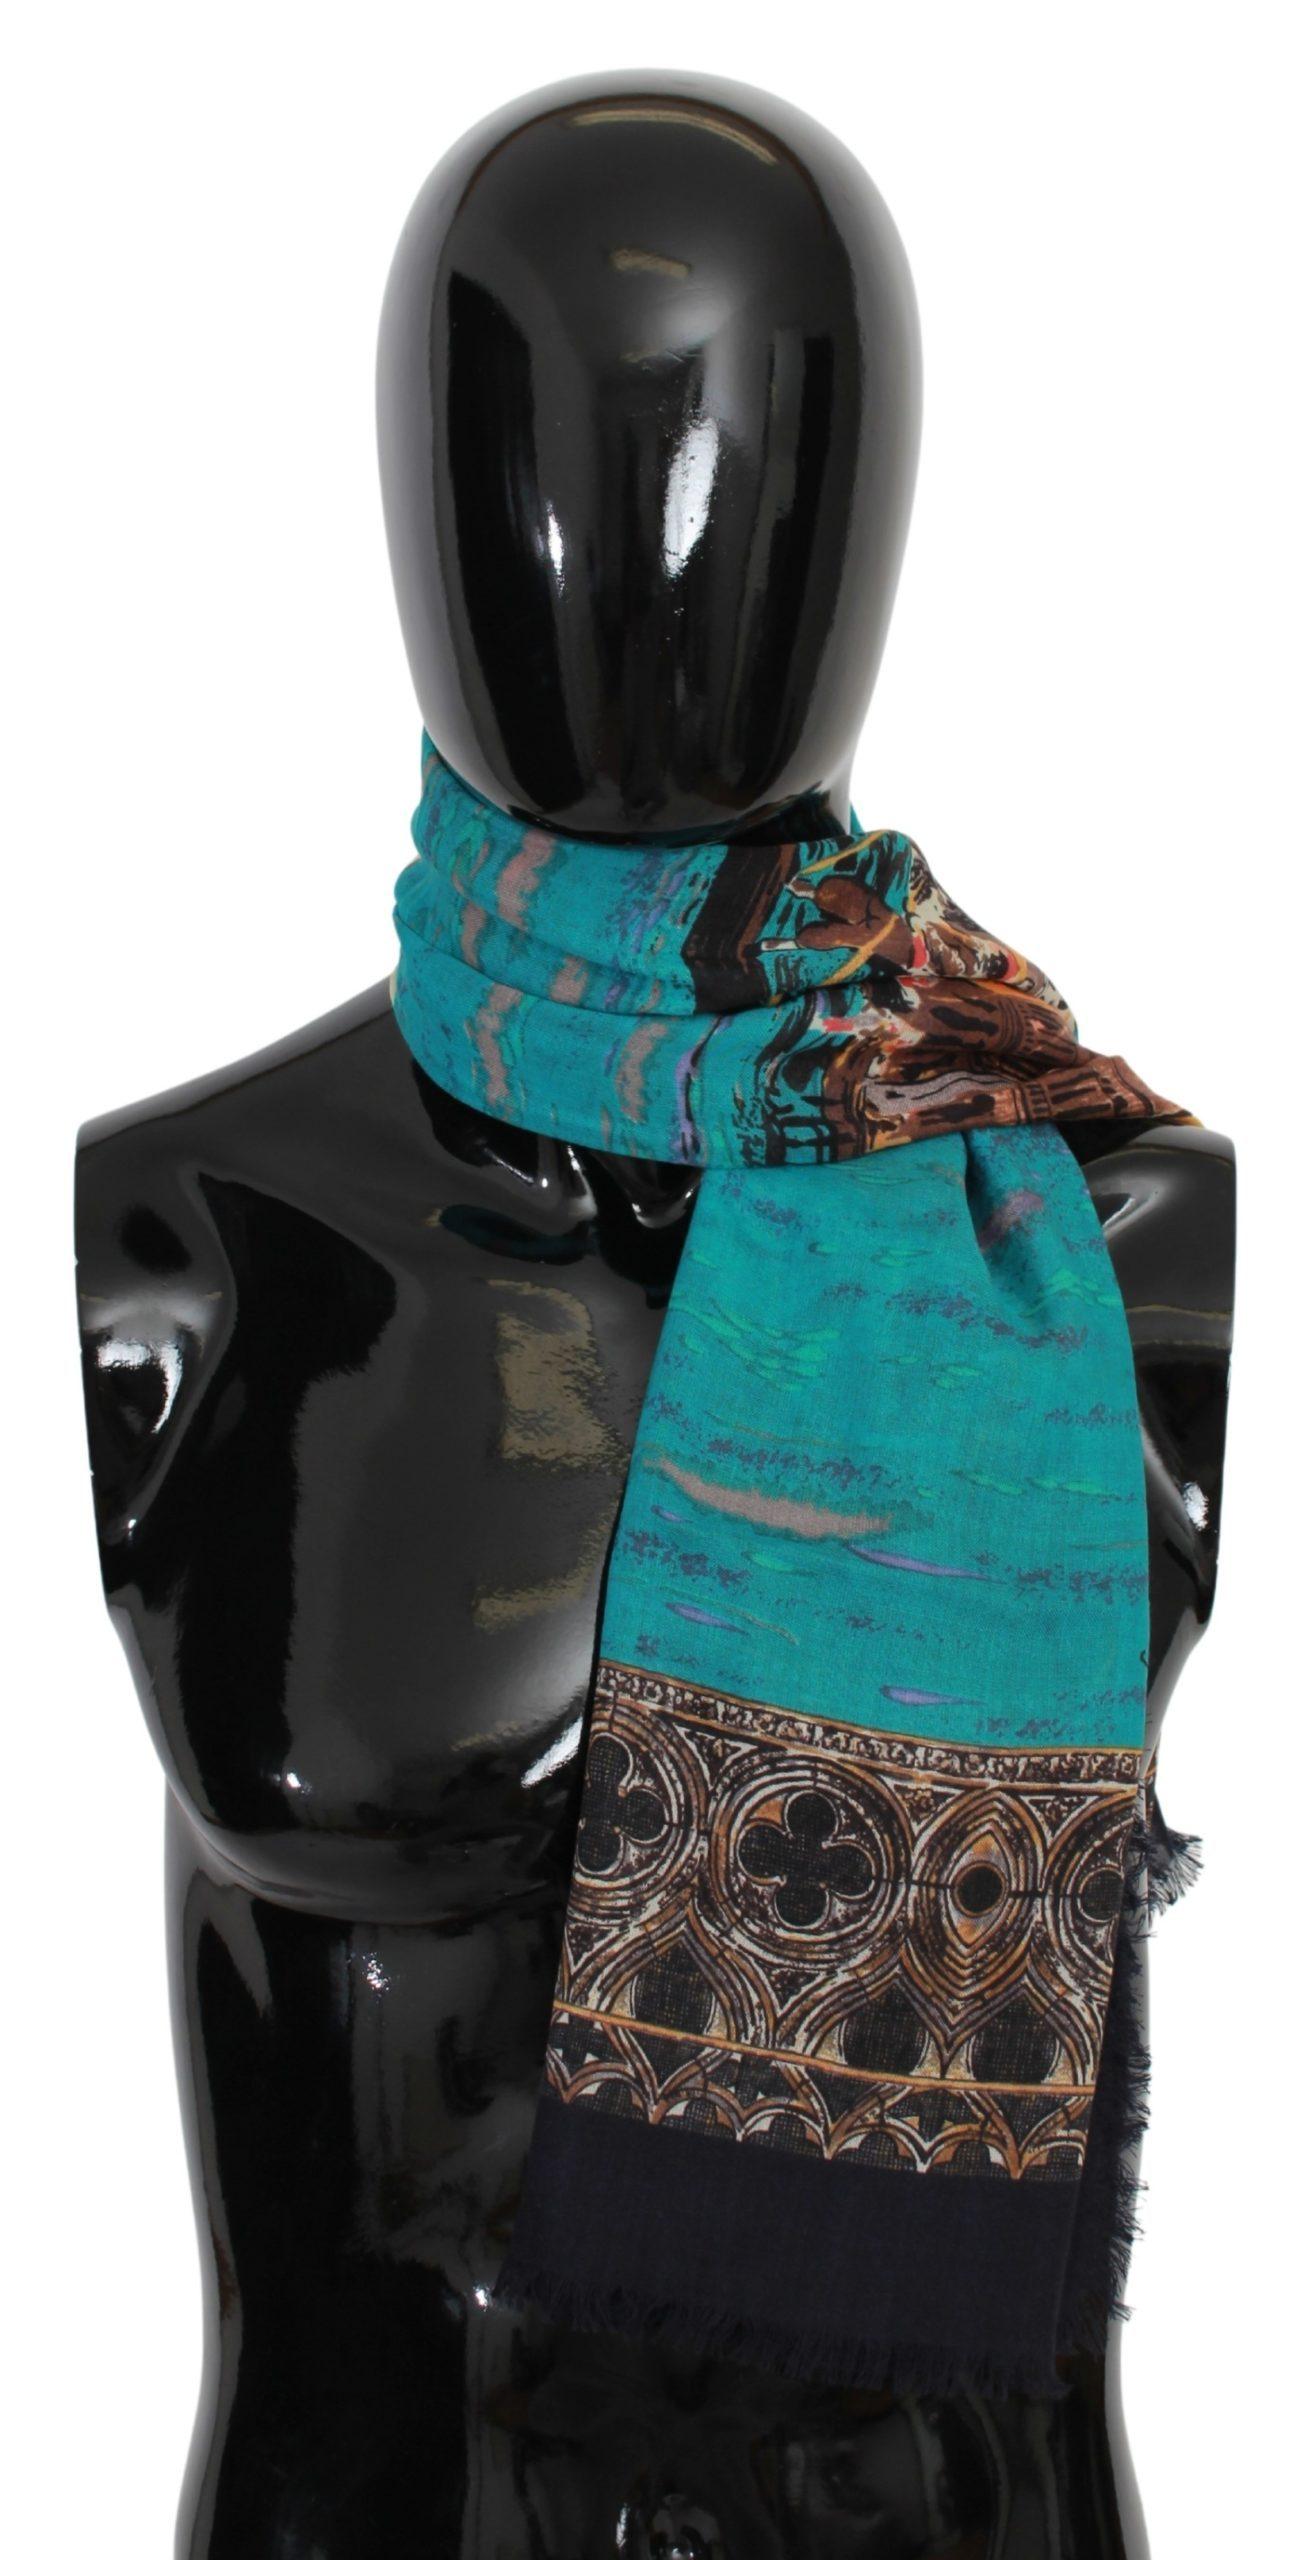 Dolce & Gabbana Men's Venice Print Cashmere Scarf Multicolor MS1681